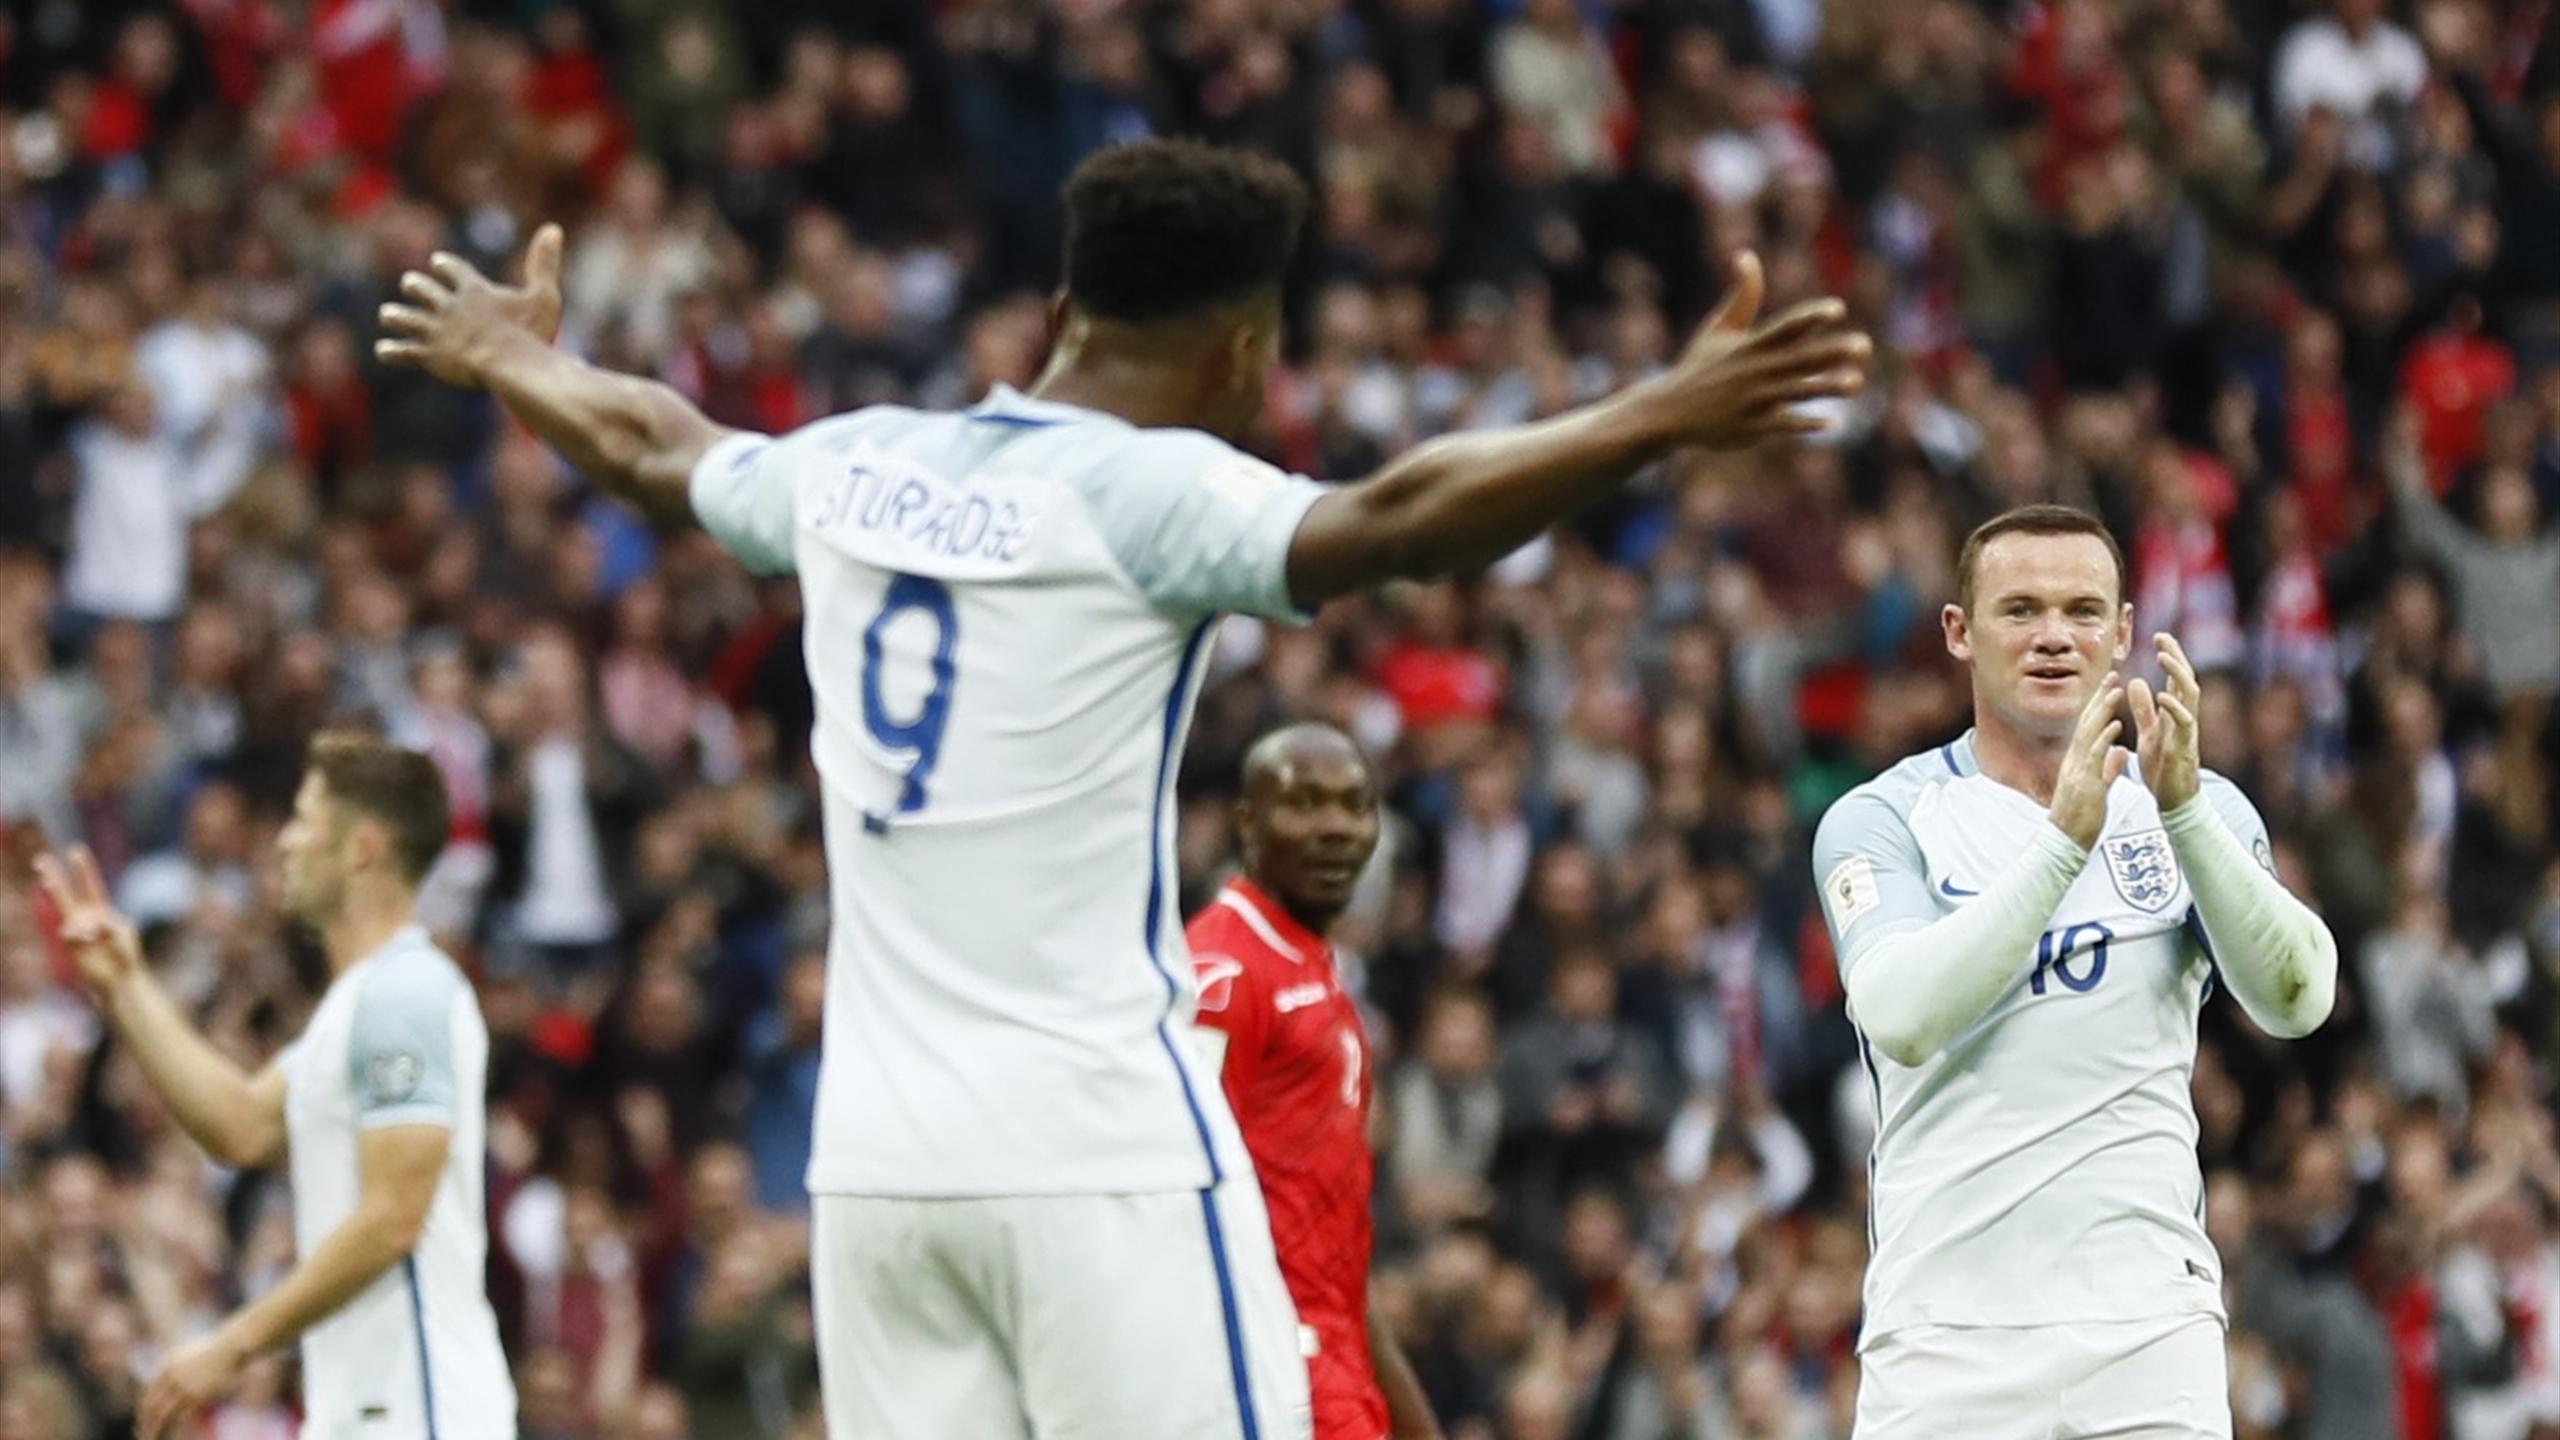 England's Daniel Sturridge celebrates scoring their first goal with Wayne Rooney